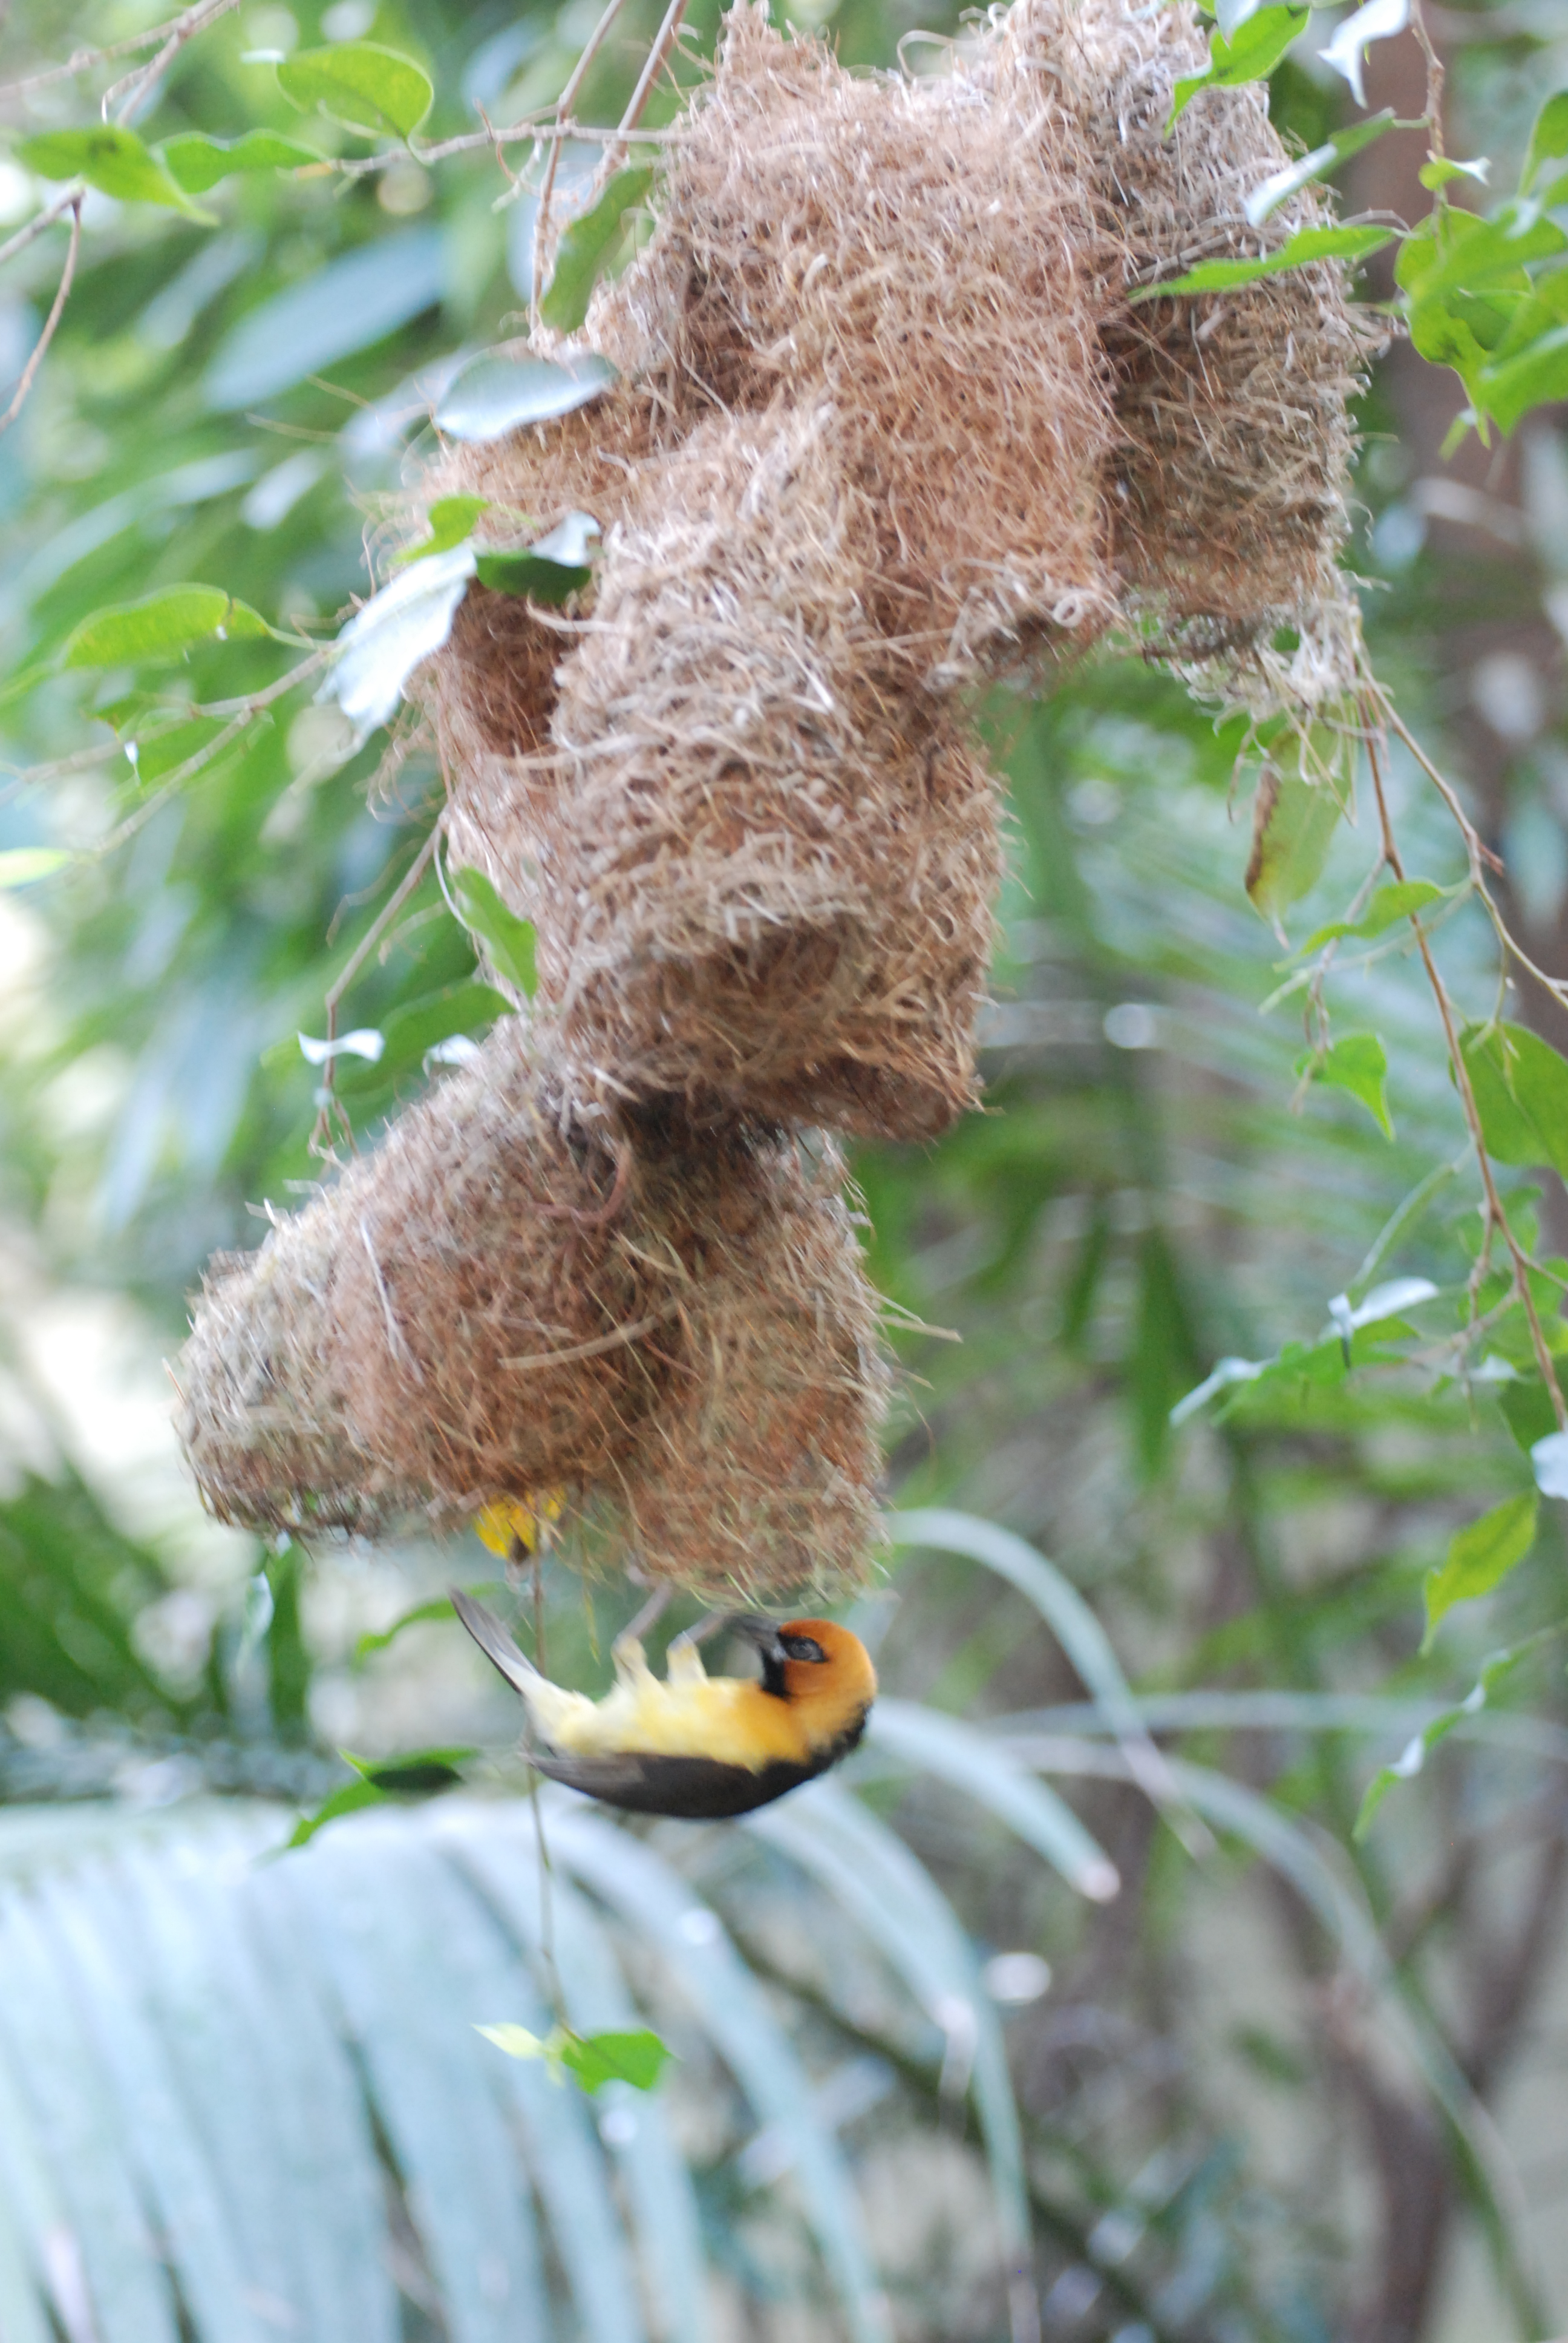 Sortnakket væver - Ploceus nigricollis (Kbh ZOO)